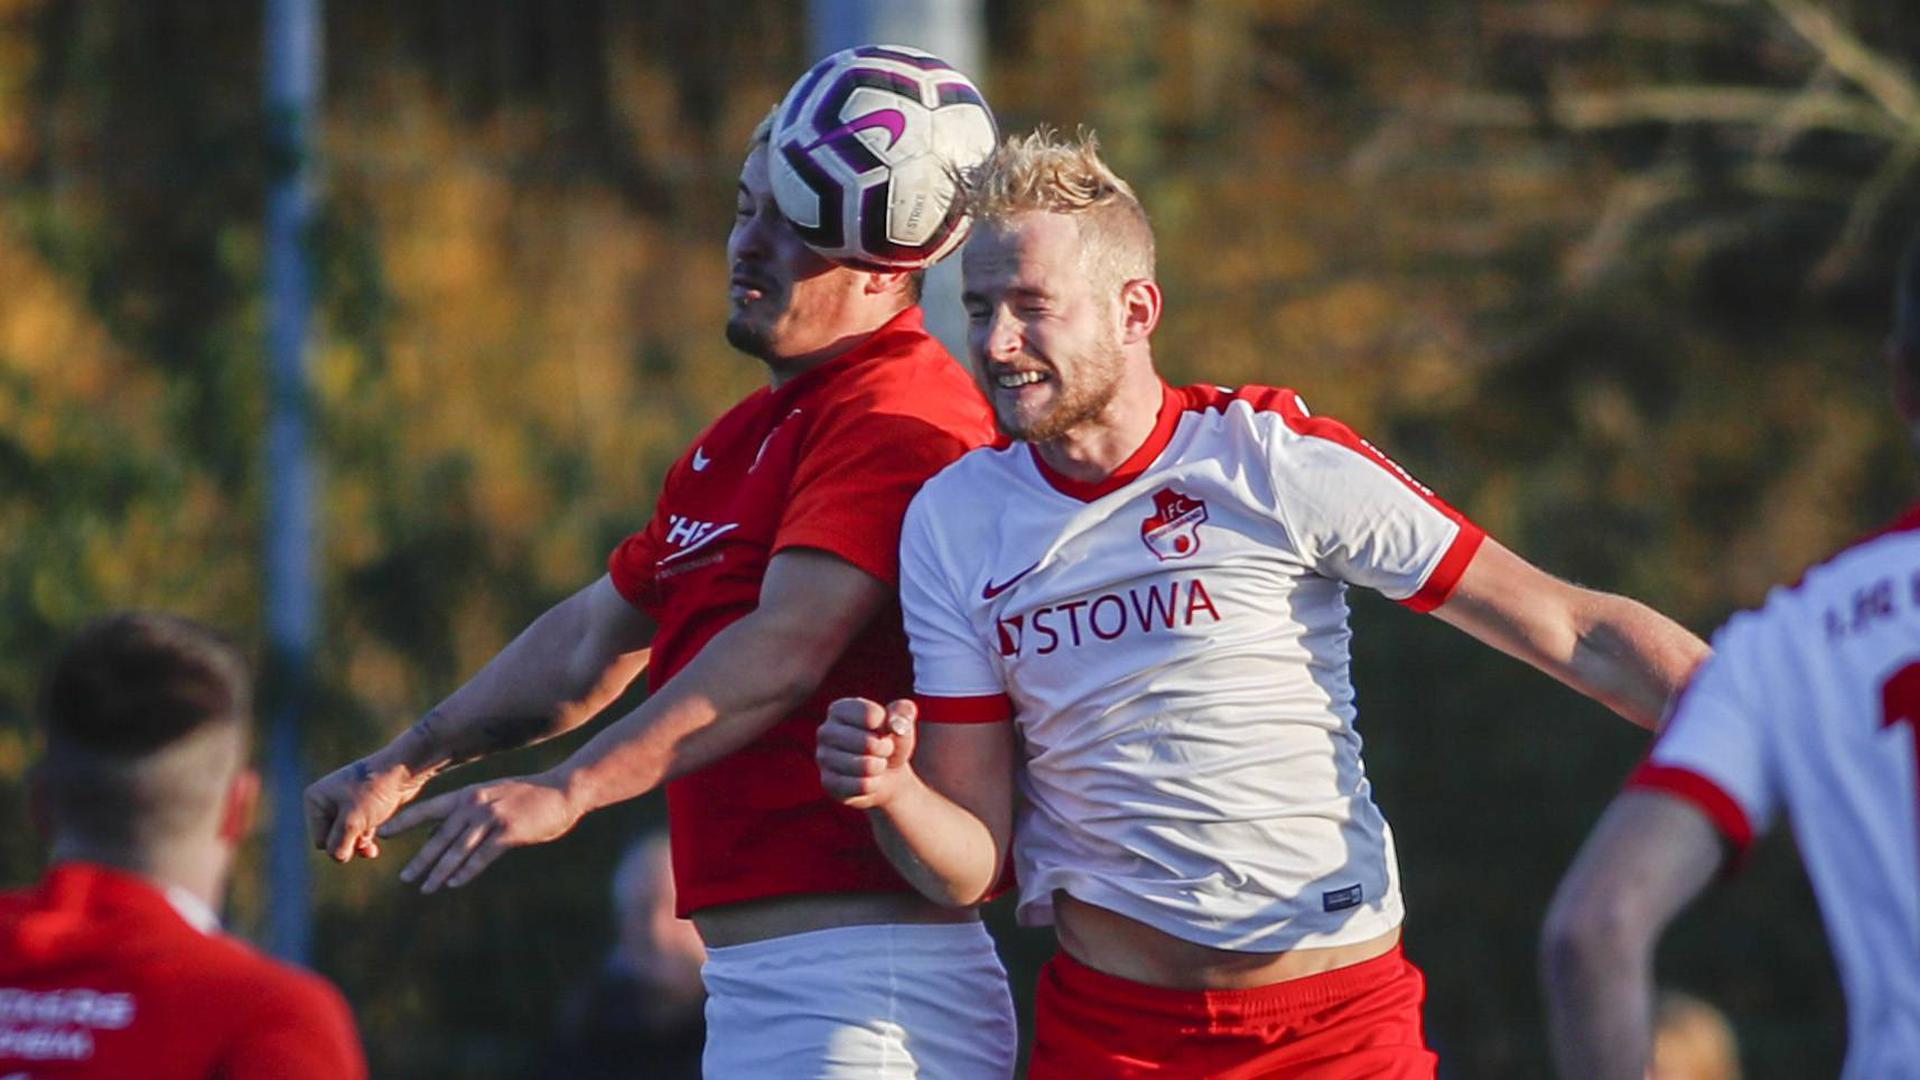 Dennis Zenko (rot, Kickers Pforzheim) gegen Niclas Grosse (weiß, FC Engelsbrand)